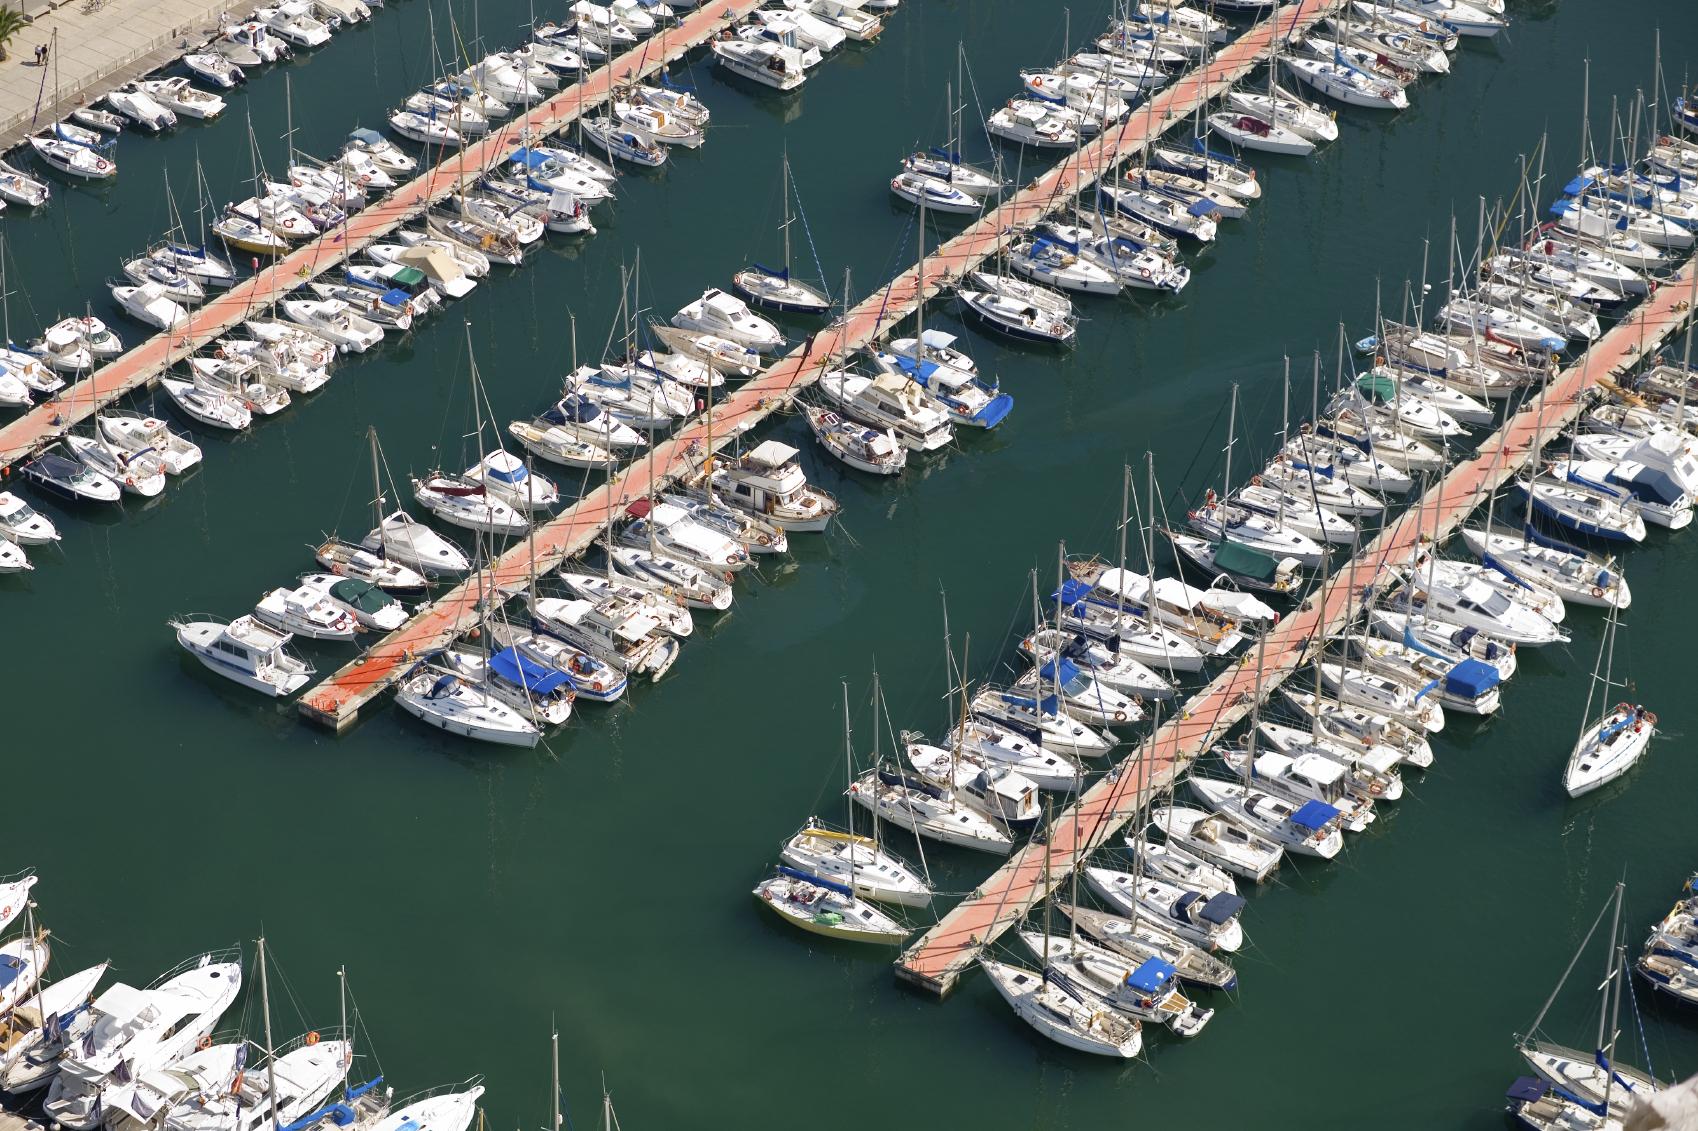 Yacht Slip Rent Or Buy Yacht Insurance Global Marine Insurance